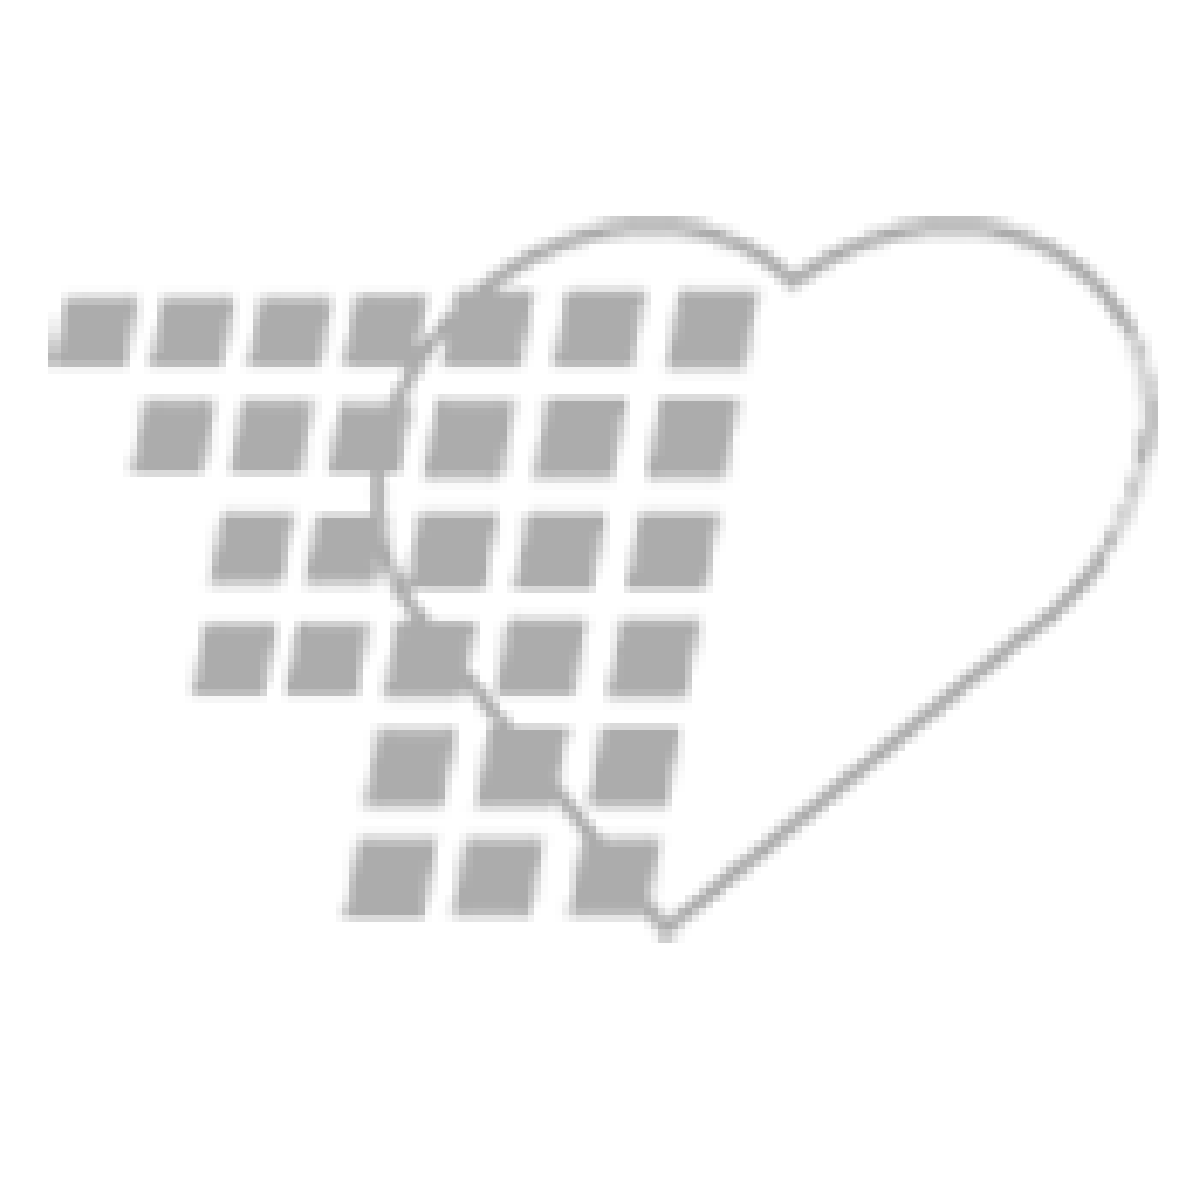 06-21-502P Multi-Sample (Blood Draw) Needle